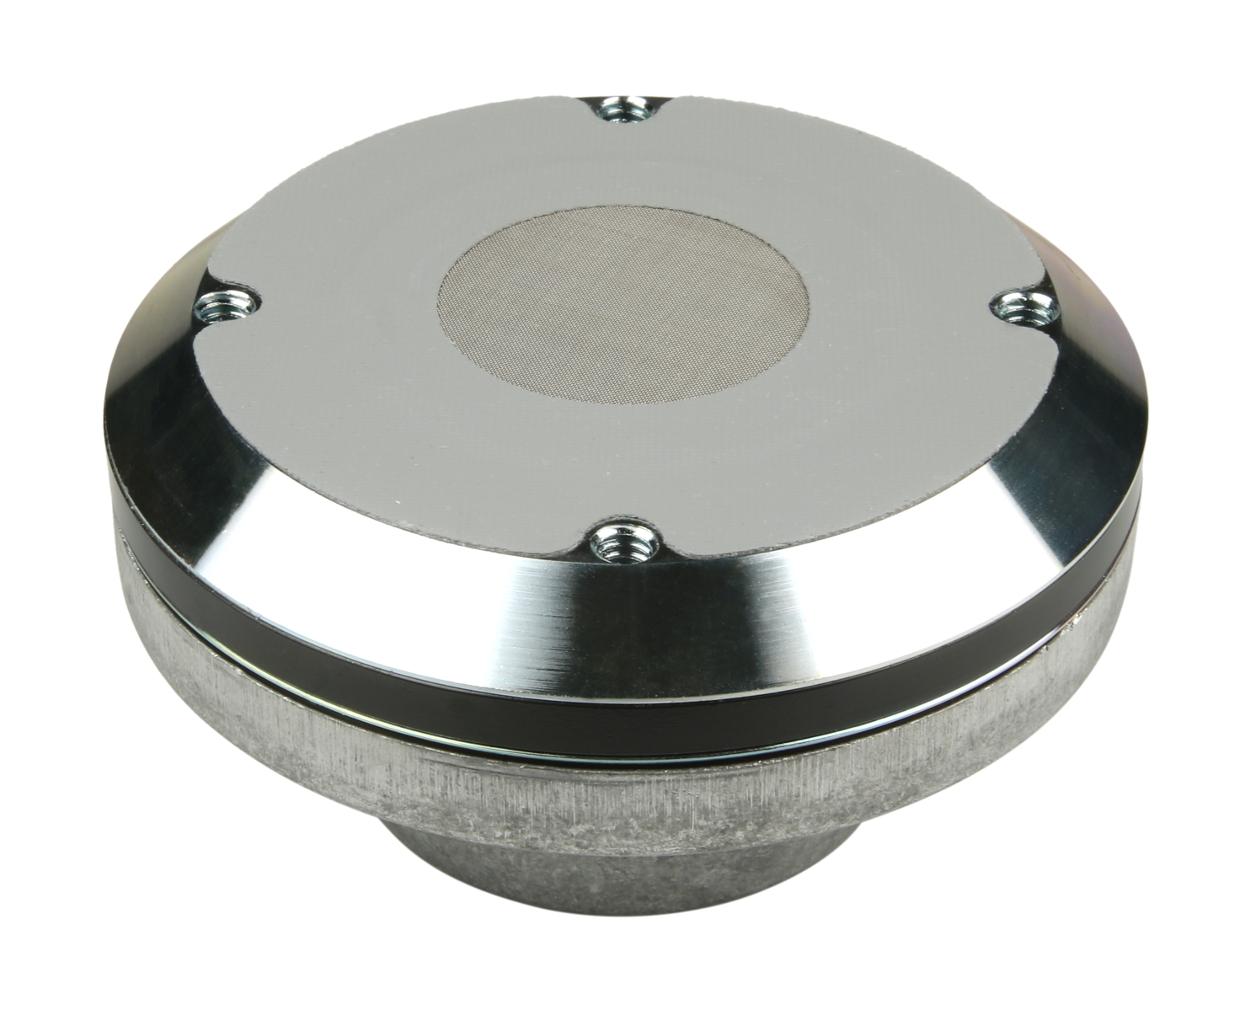 JBL 339894-002X HF Driver for 2431H/2431HPL 339894-002X